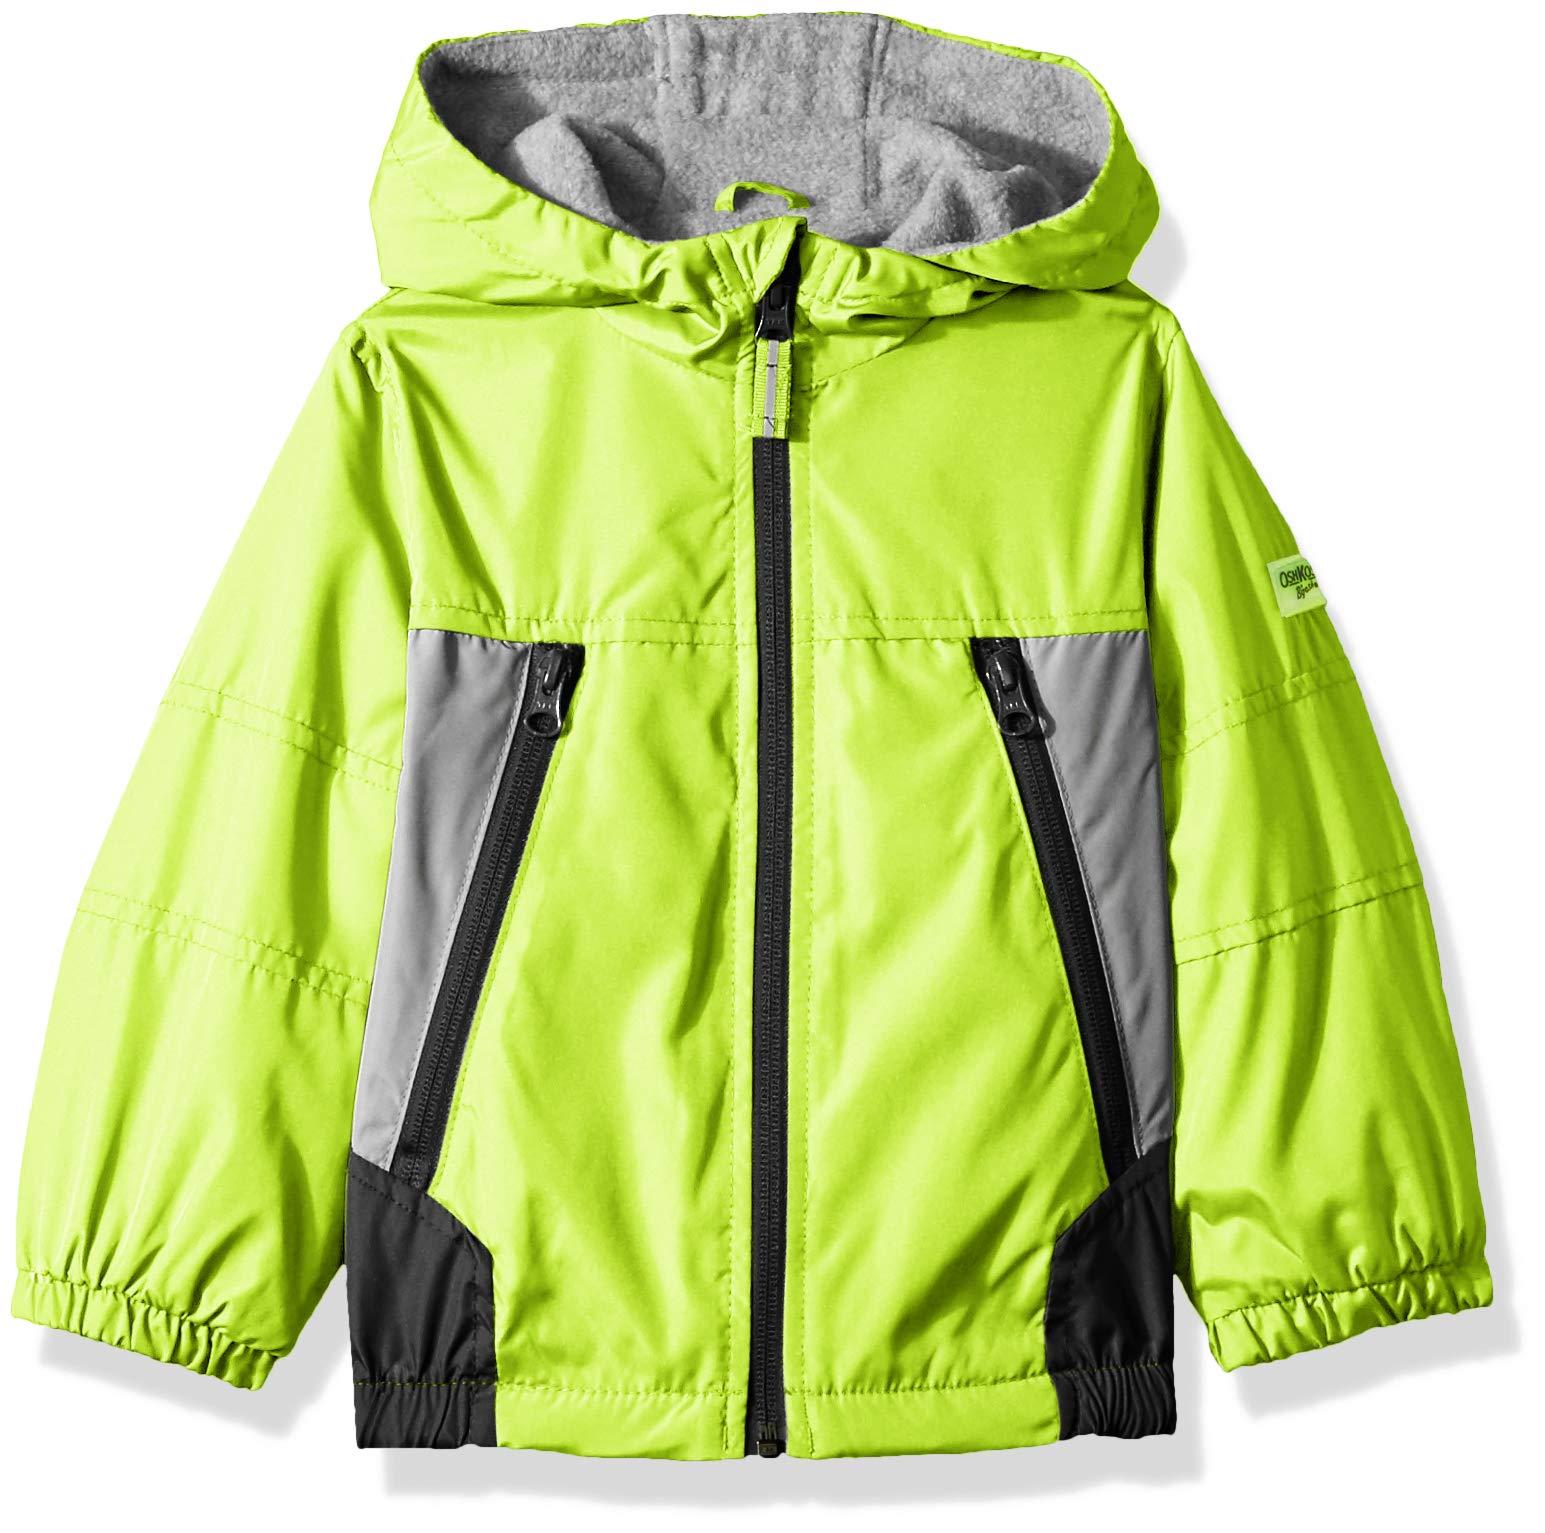 Osh Kosh Boys' Toddler Midweight Jacket, Radioactive Green/Silver/Grey 2T